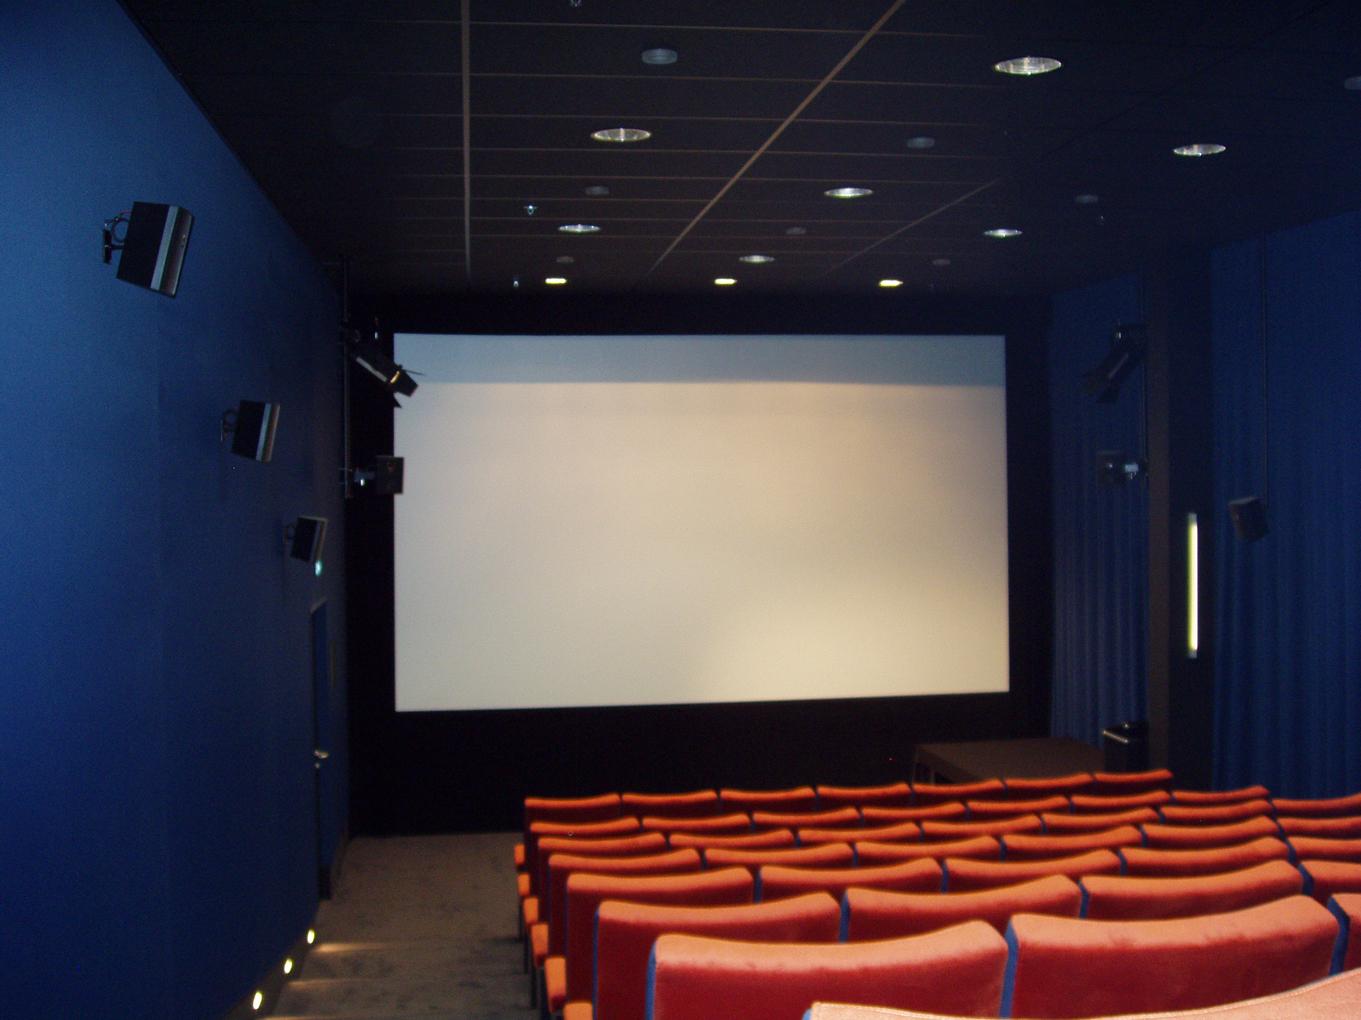 kino-bourbaki-3.JPG